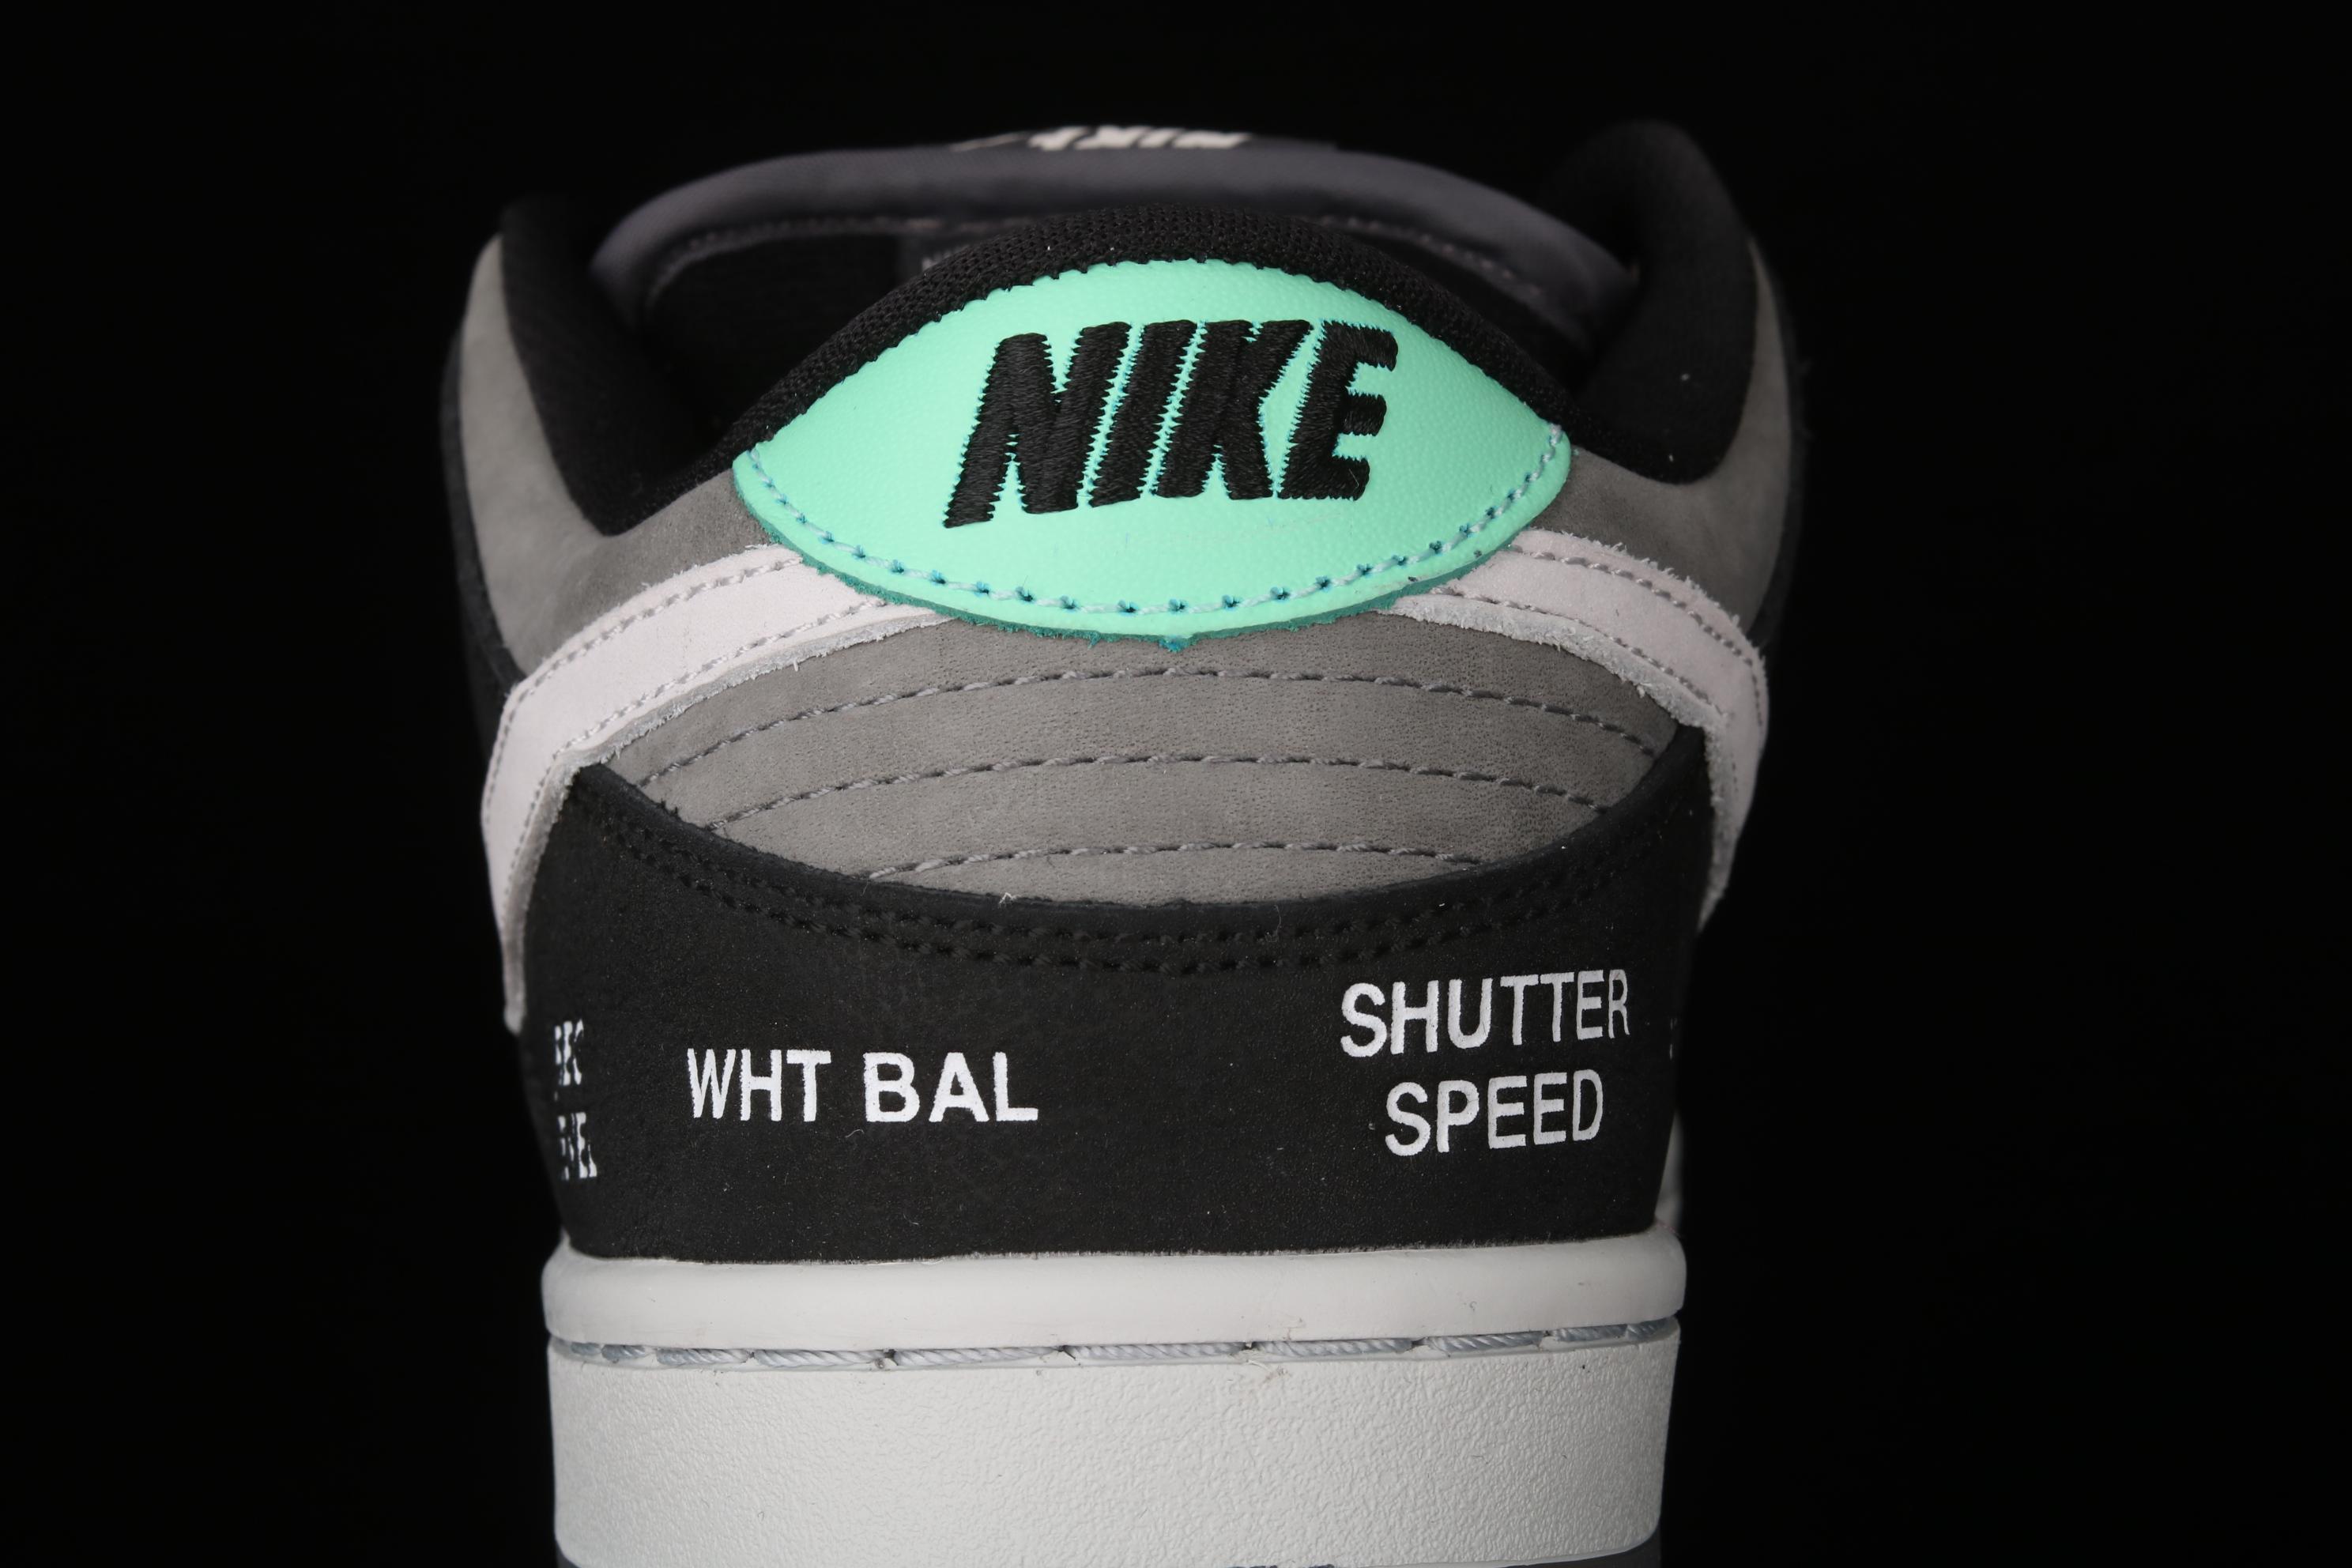 J版 Nk Dunk SB Low Pro ISO 摄相机联名 黑灰扣篮系列 复古休闲运动滑板鞋 CV1659-001